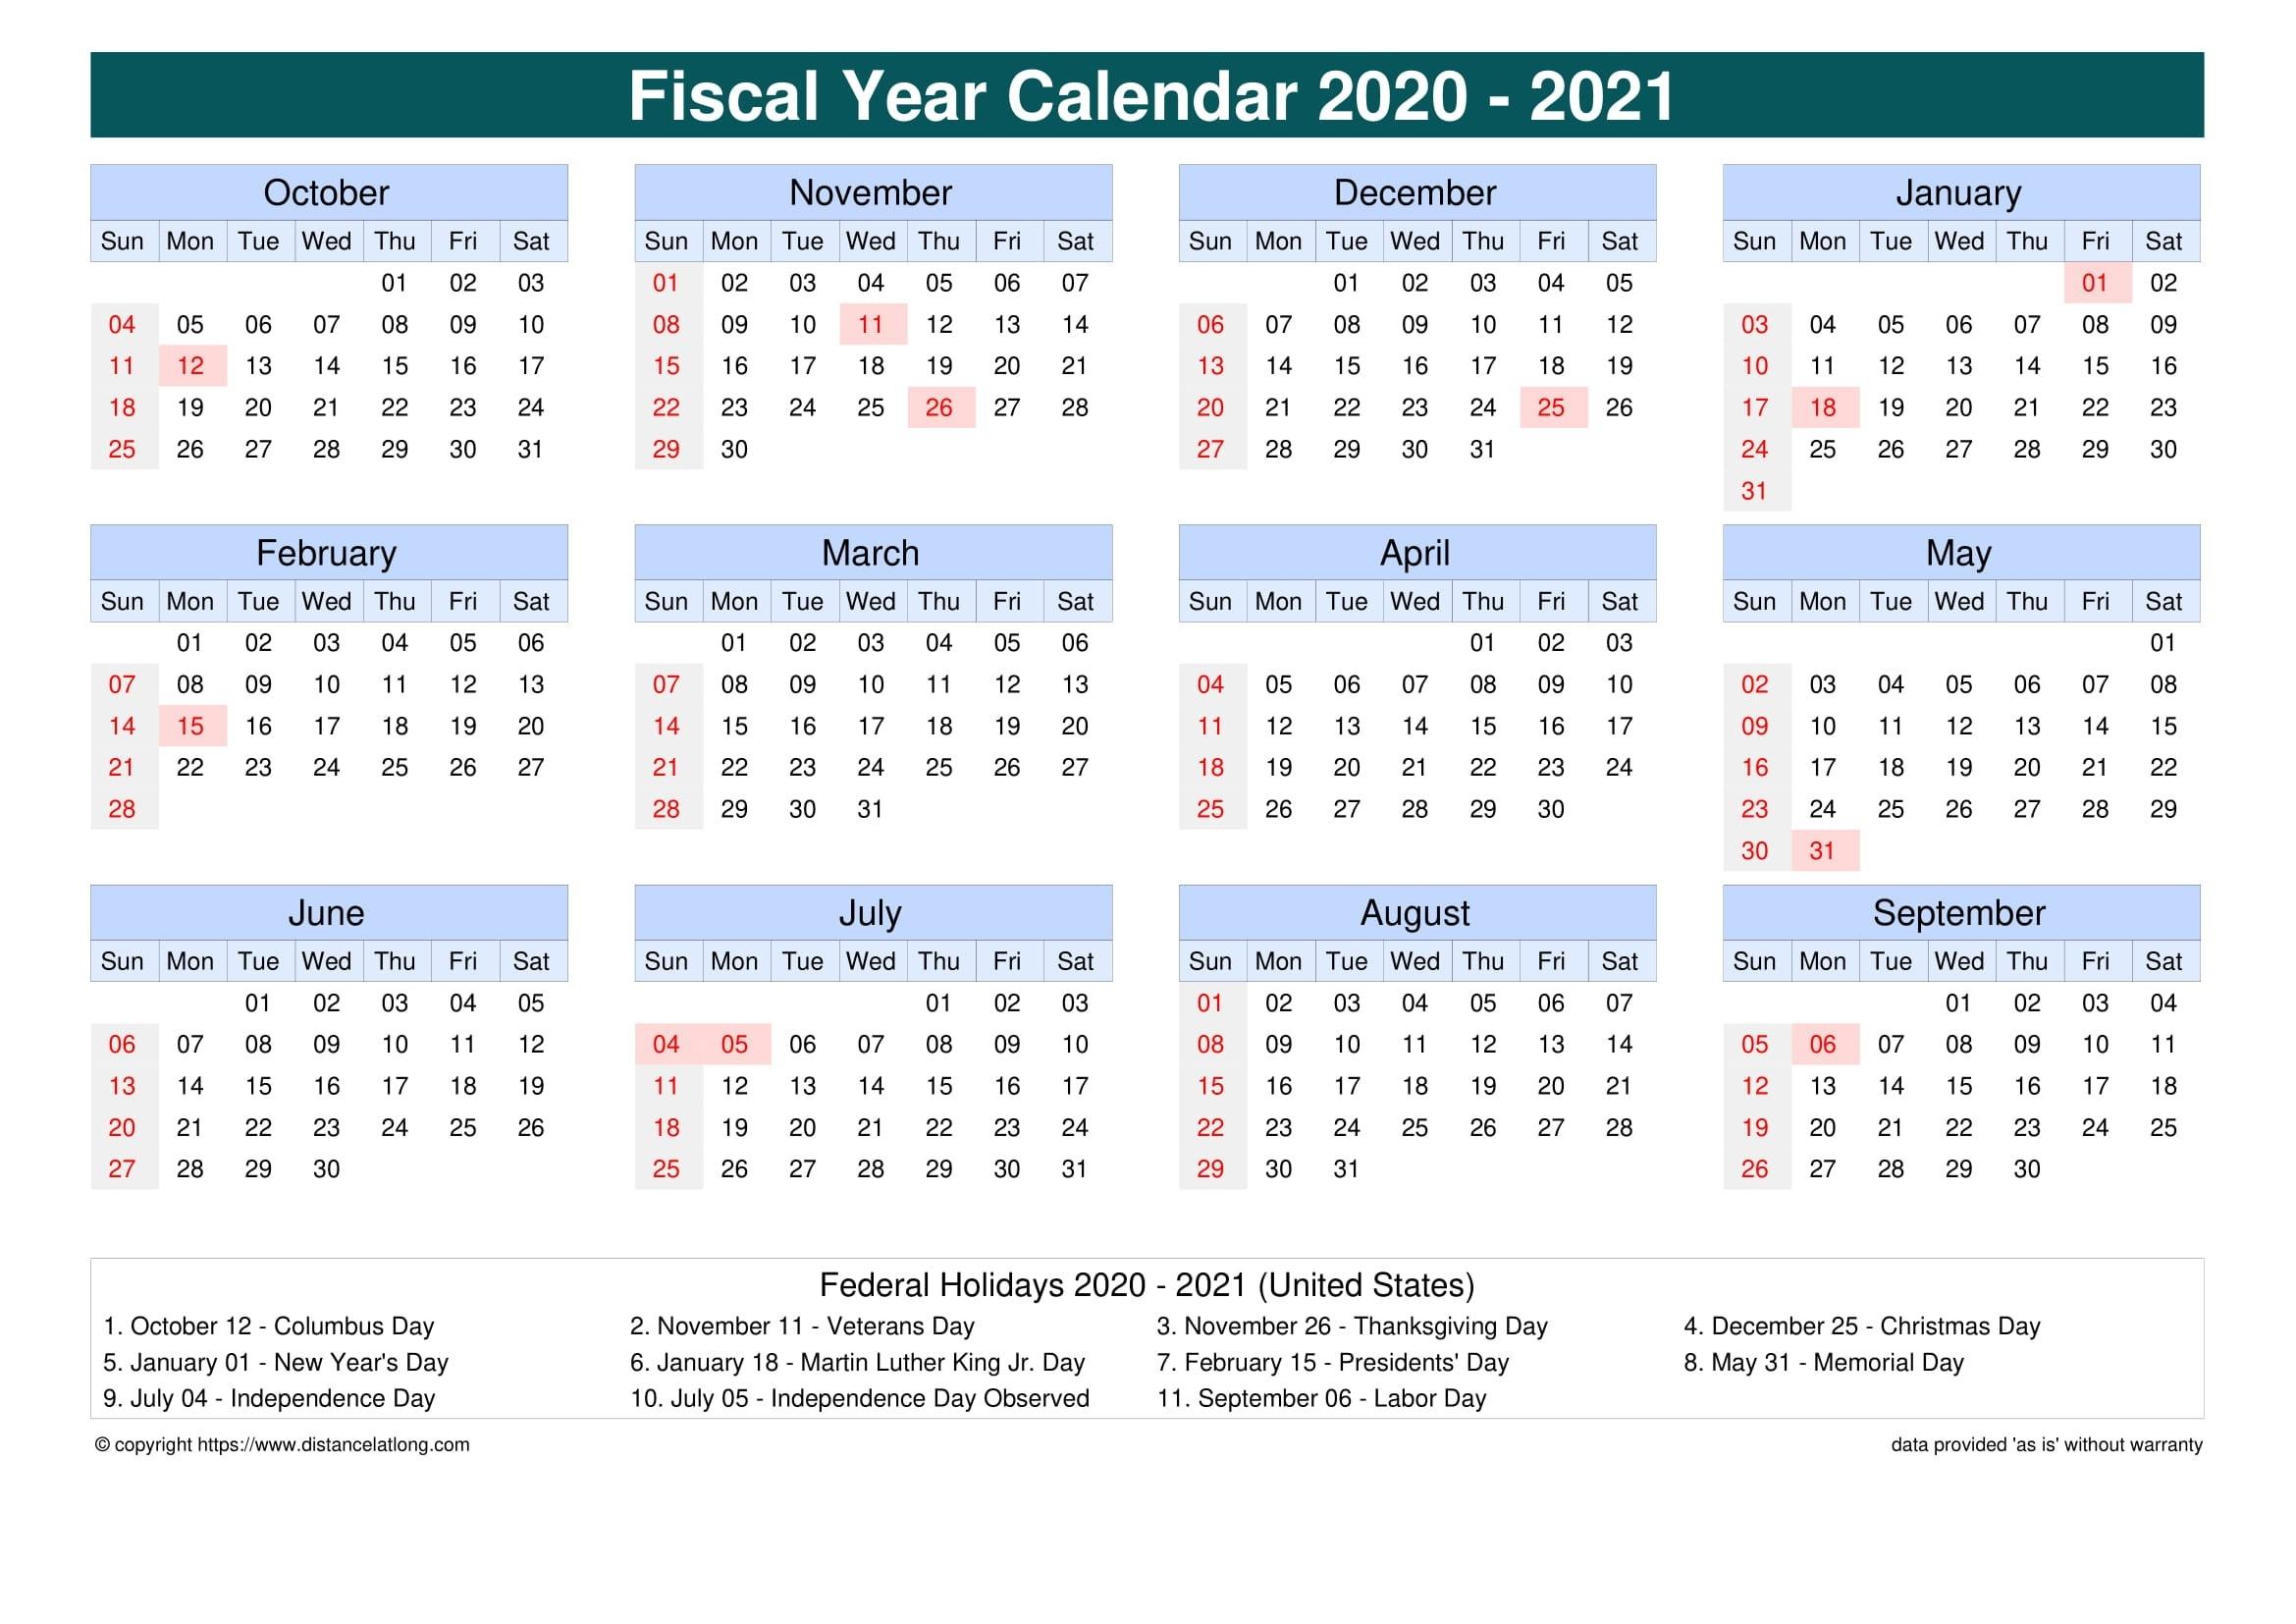 Fiscal Year 2020-2021 Calendar Templates, Free Printable  Fiscal Calendar Australia 2021